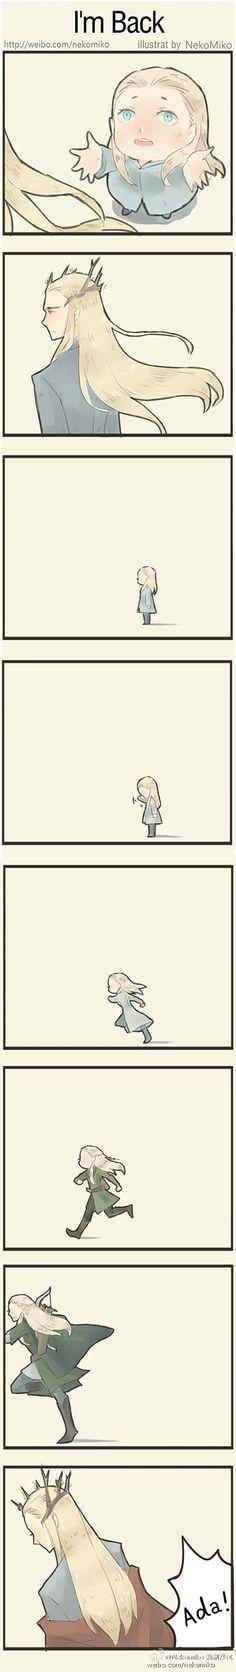 Thranduil and Legolas - I´m Back by Nekomiko_秘制沙包(微博)